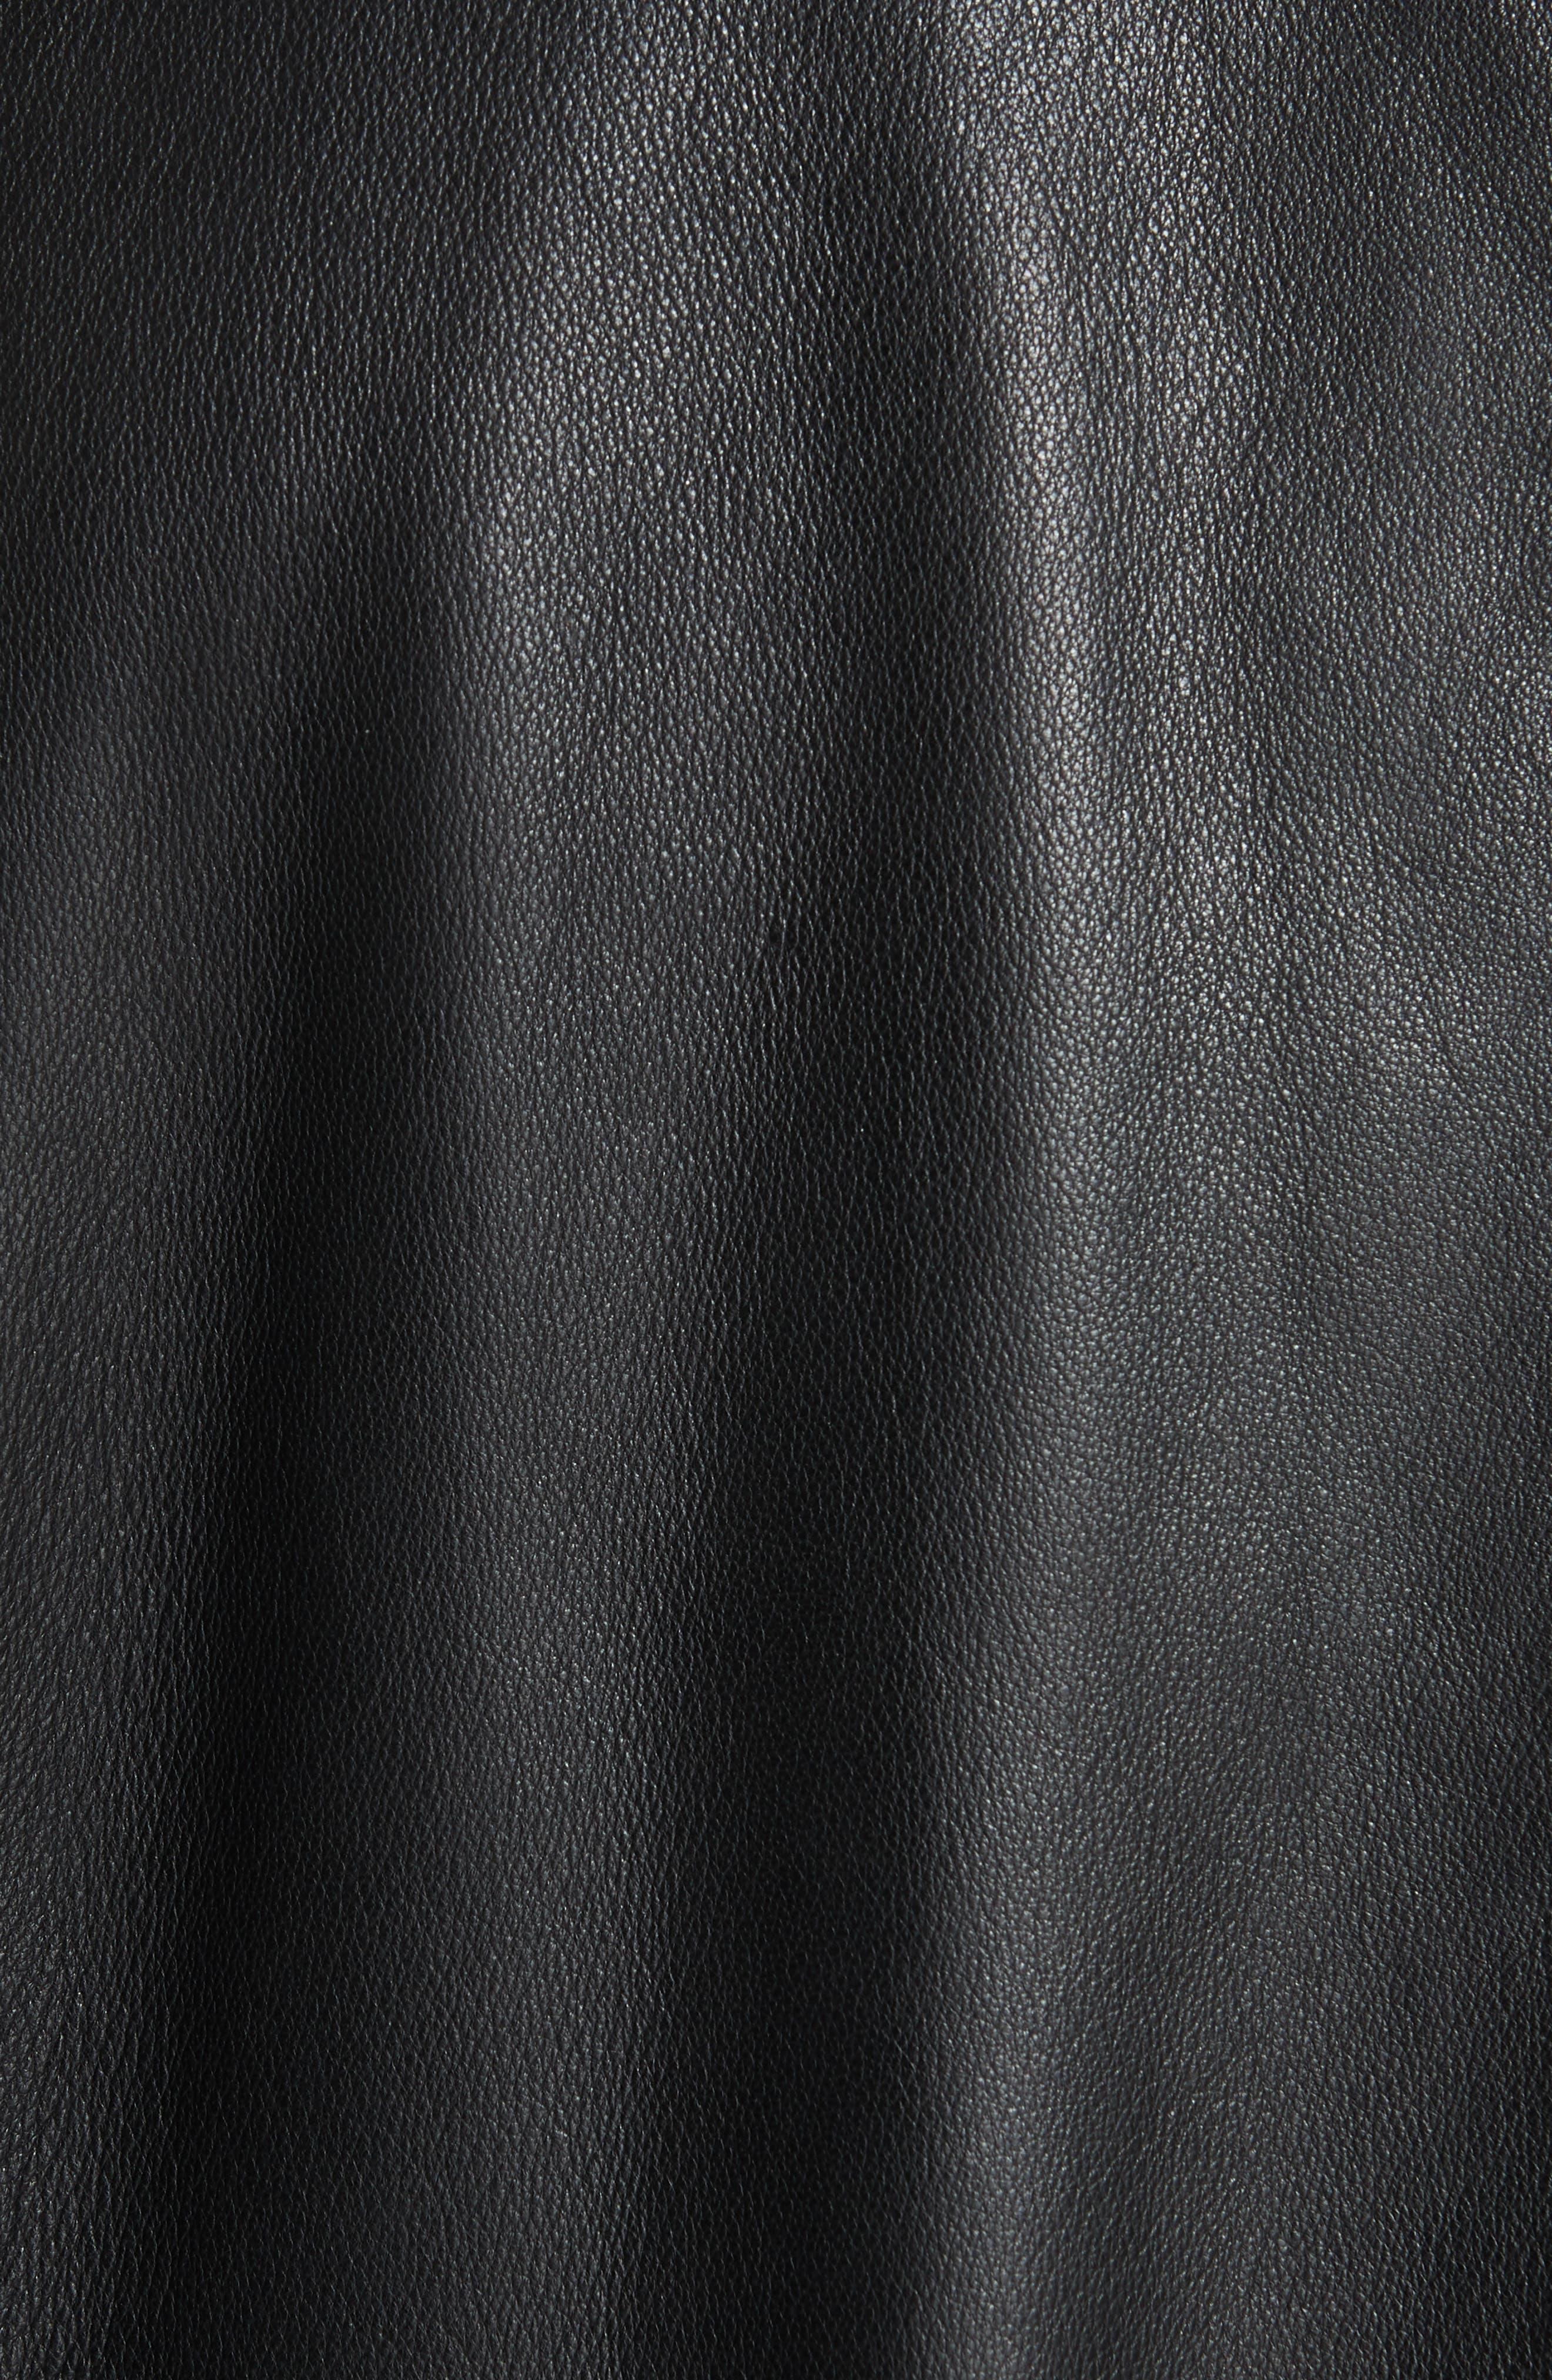 EMPORIO ARMANI, Leather Bomber Jacket, Alternate thumbnail 7, color, BLACK